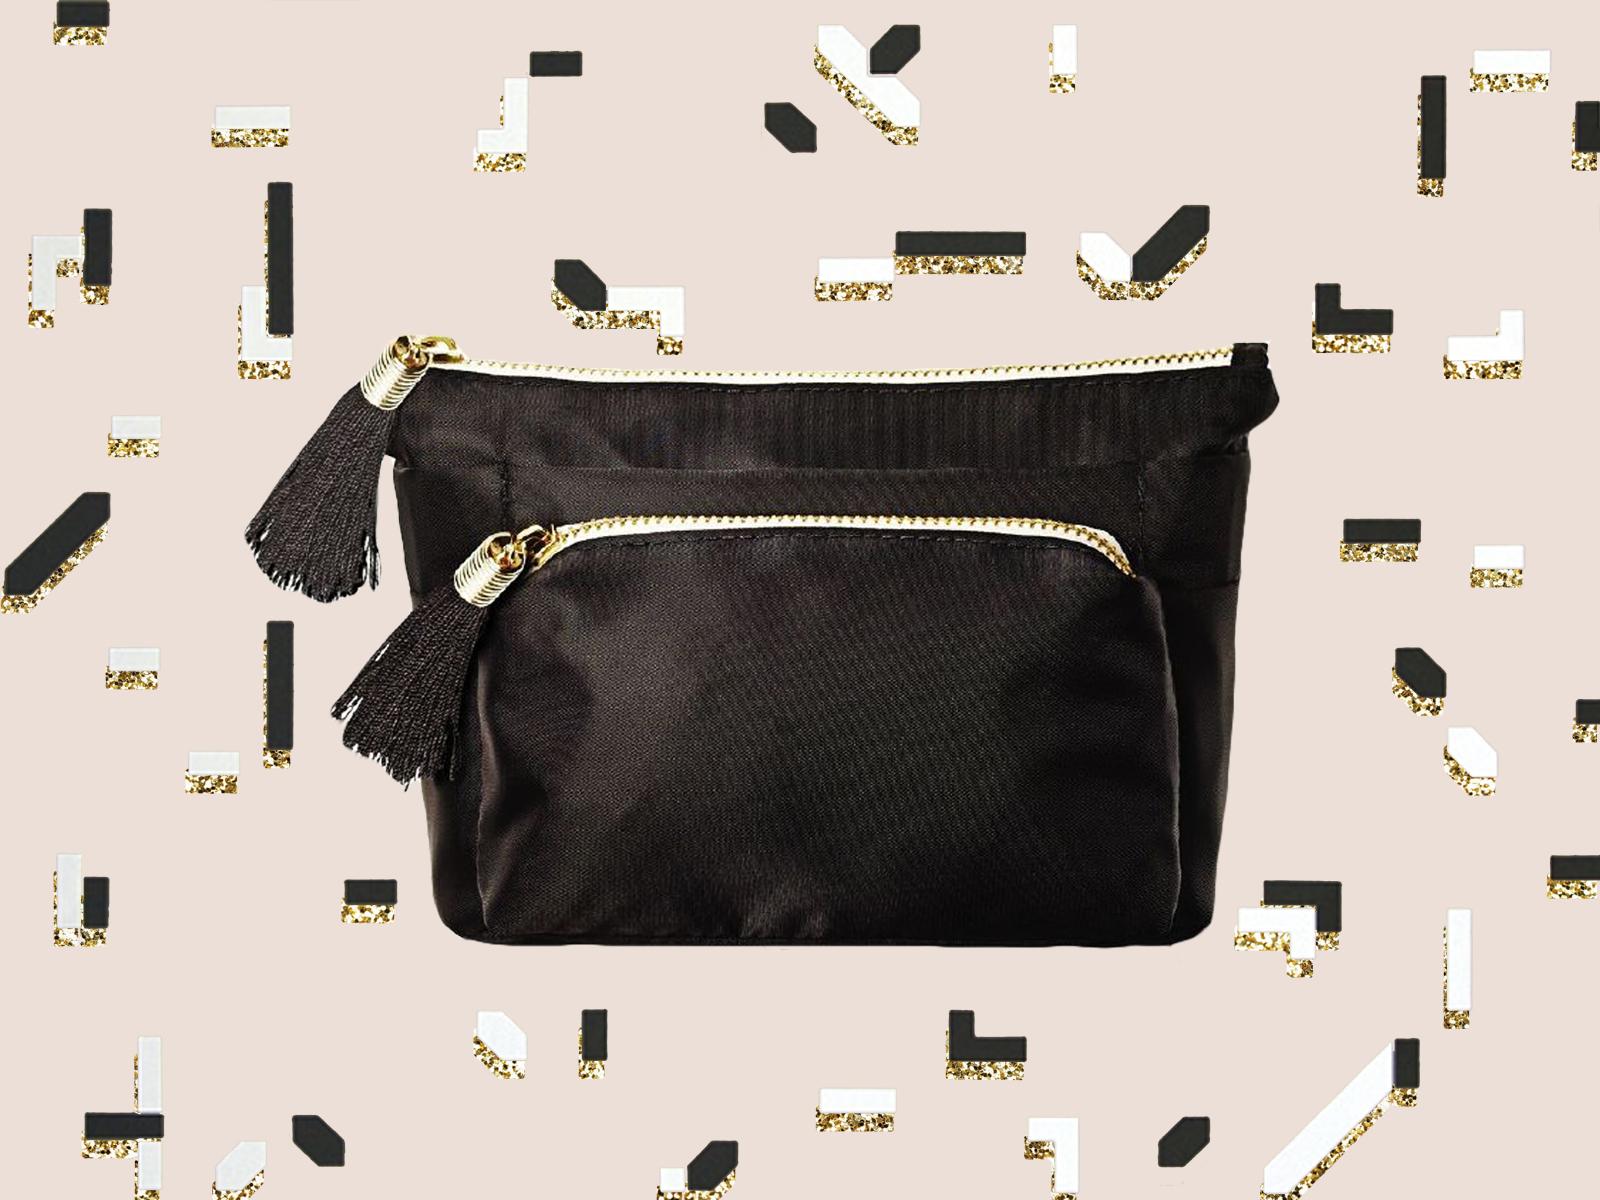 SK Holiday Cosmetic Bag copy.jpg